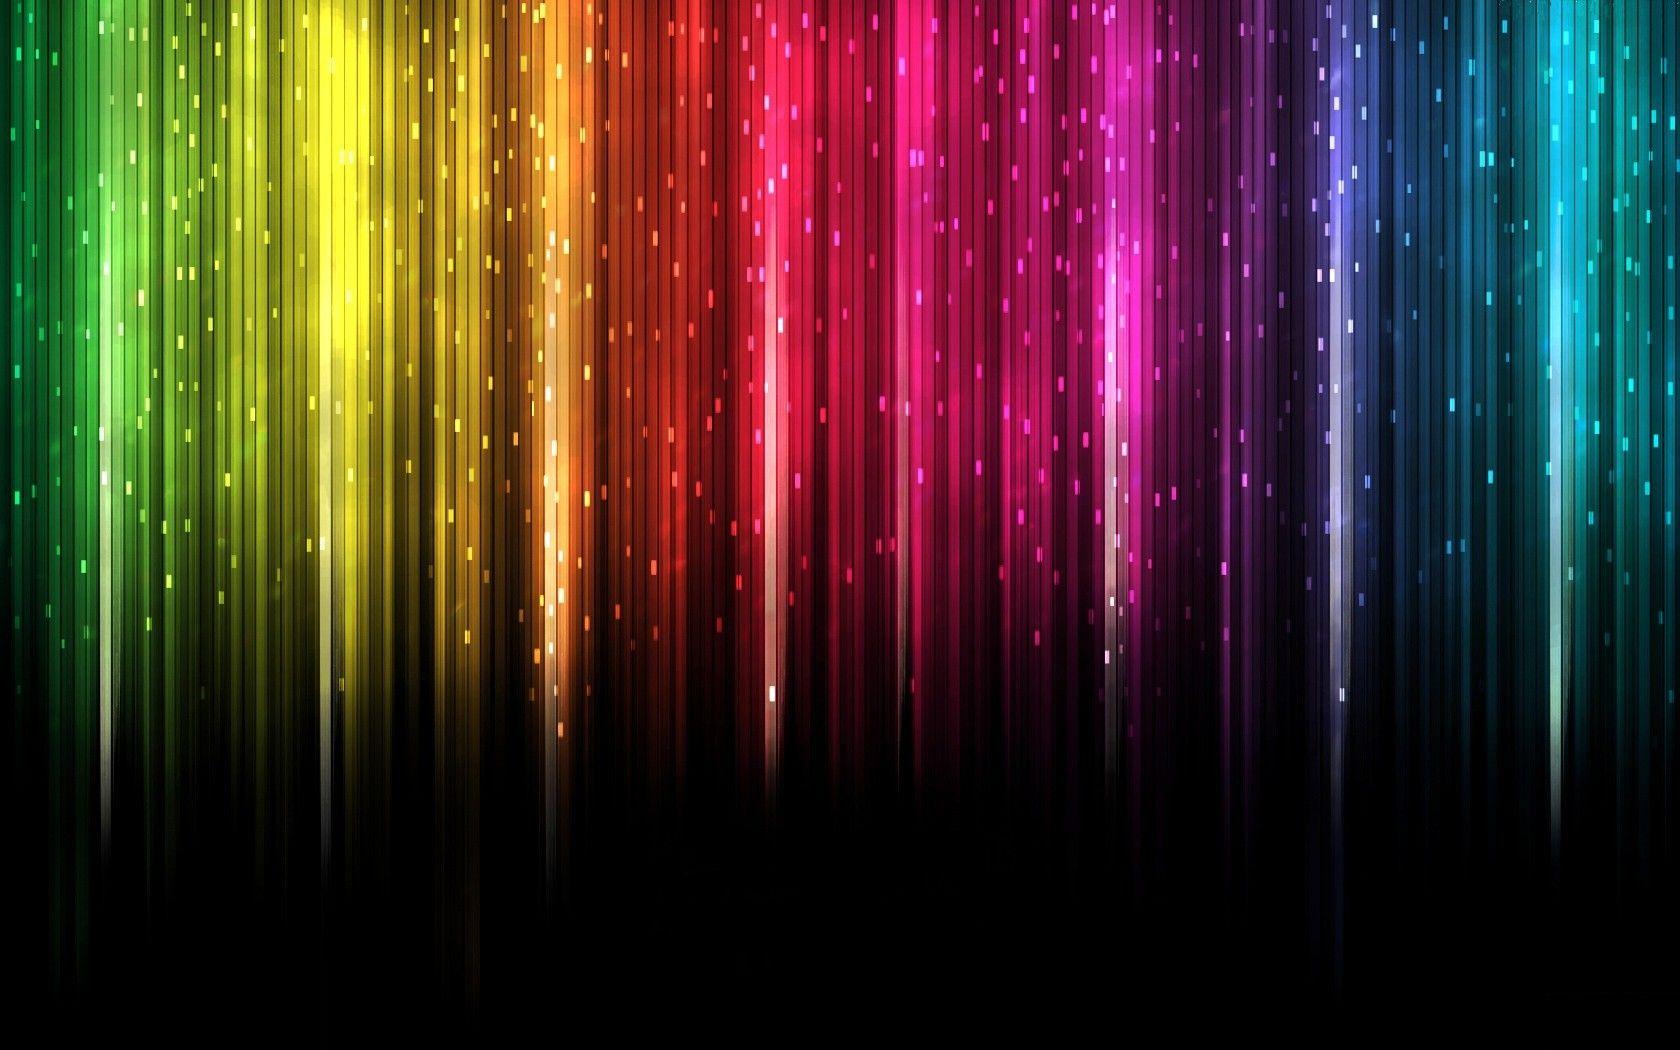 Wallpapers colors electrizante pentru vibrant electrical - Vibrant background ...